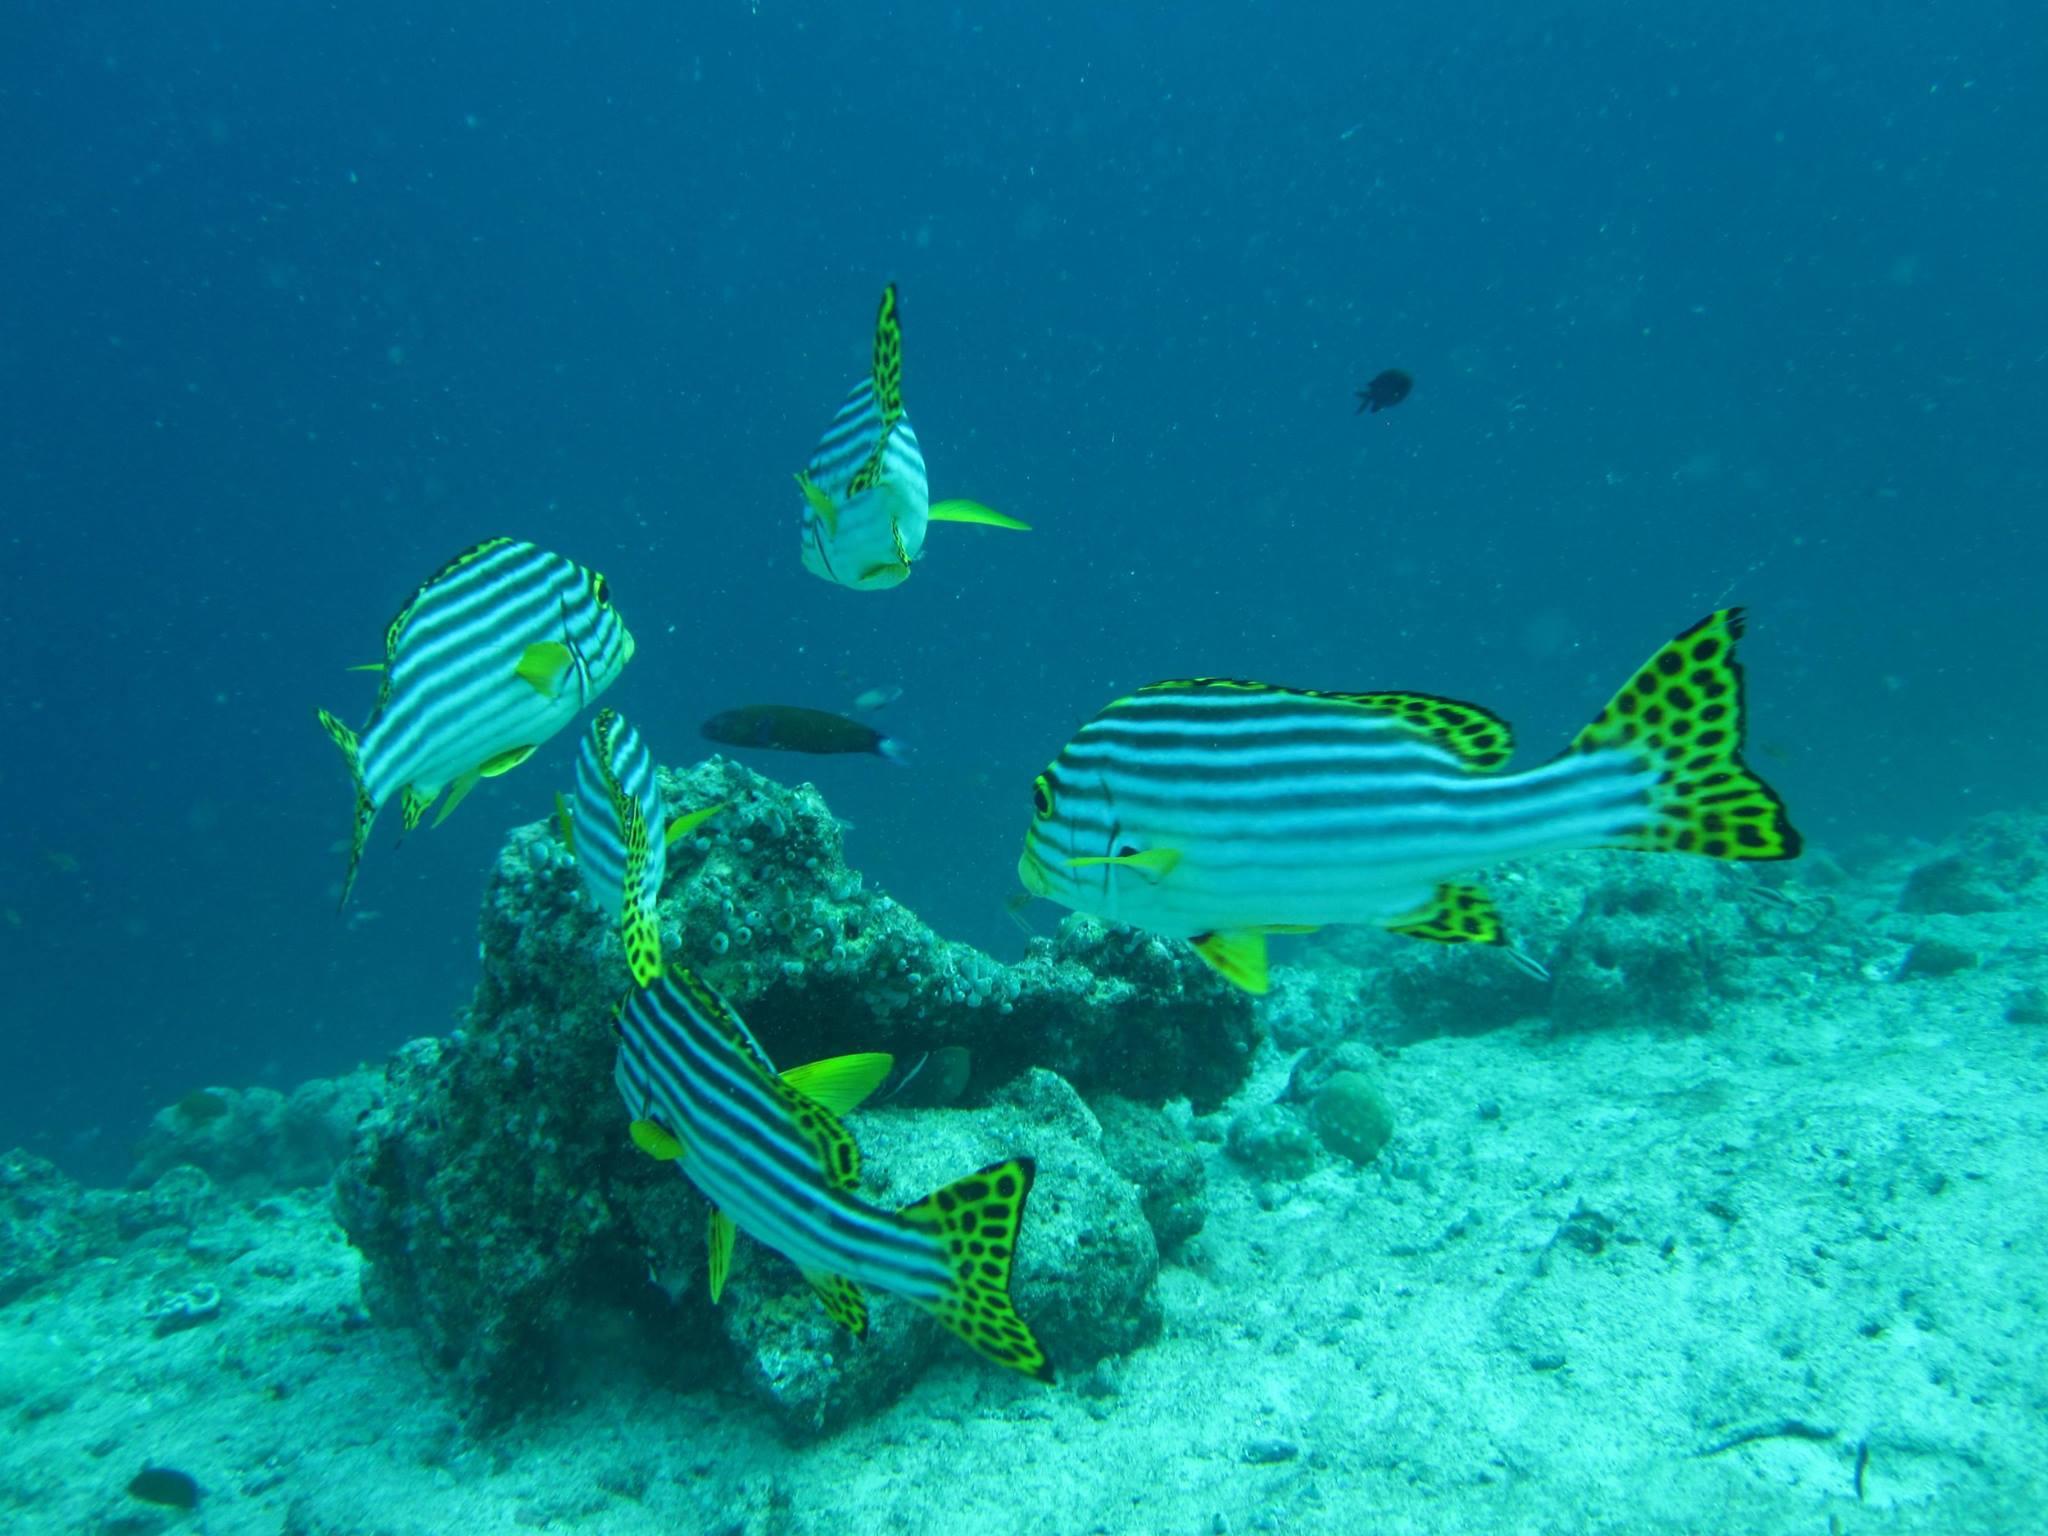 invite-to-paradise-sri-lanka-and-maldives-specialists-travel-agent-tour-operator-customer-review--feedback-joel-rhian-atmopshere-kanifushi-diving-fish.jpg